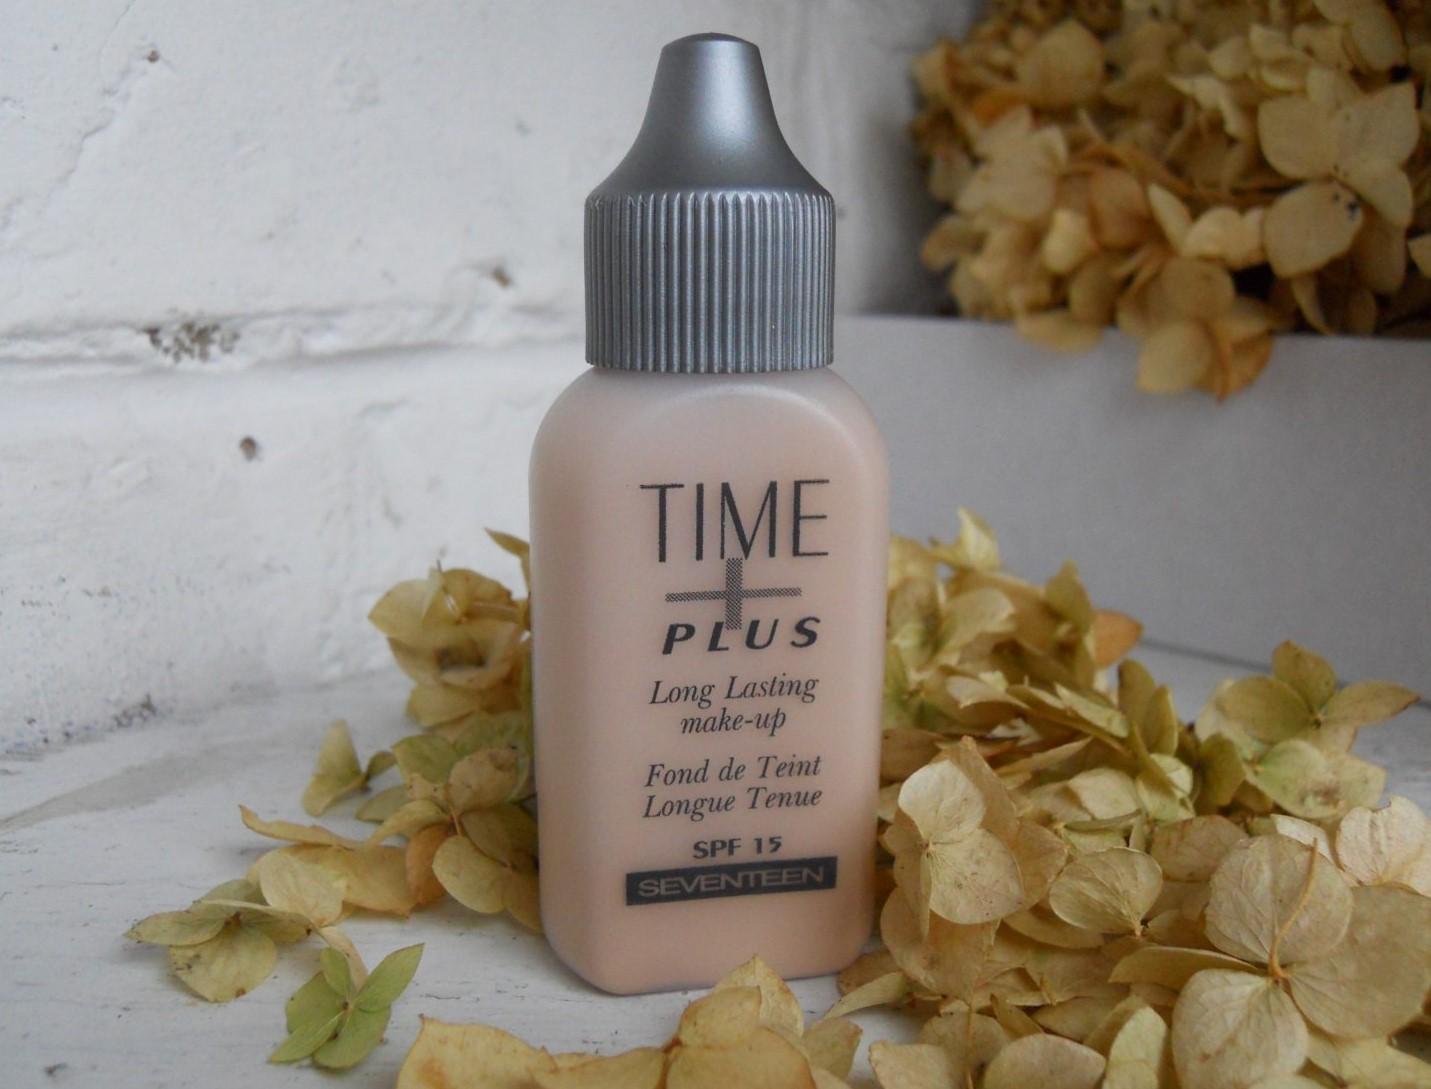 Seventeen Тональный крем Time Plus Long Lasting make-up